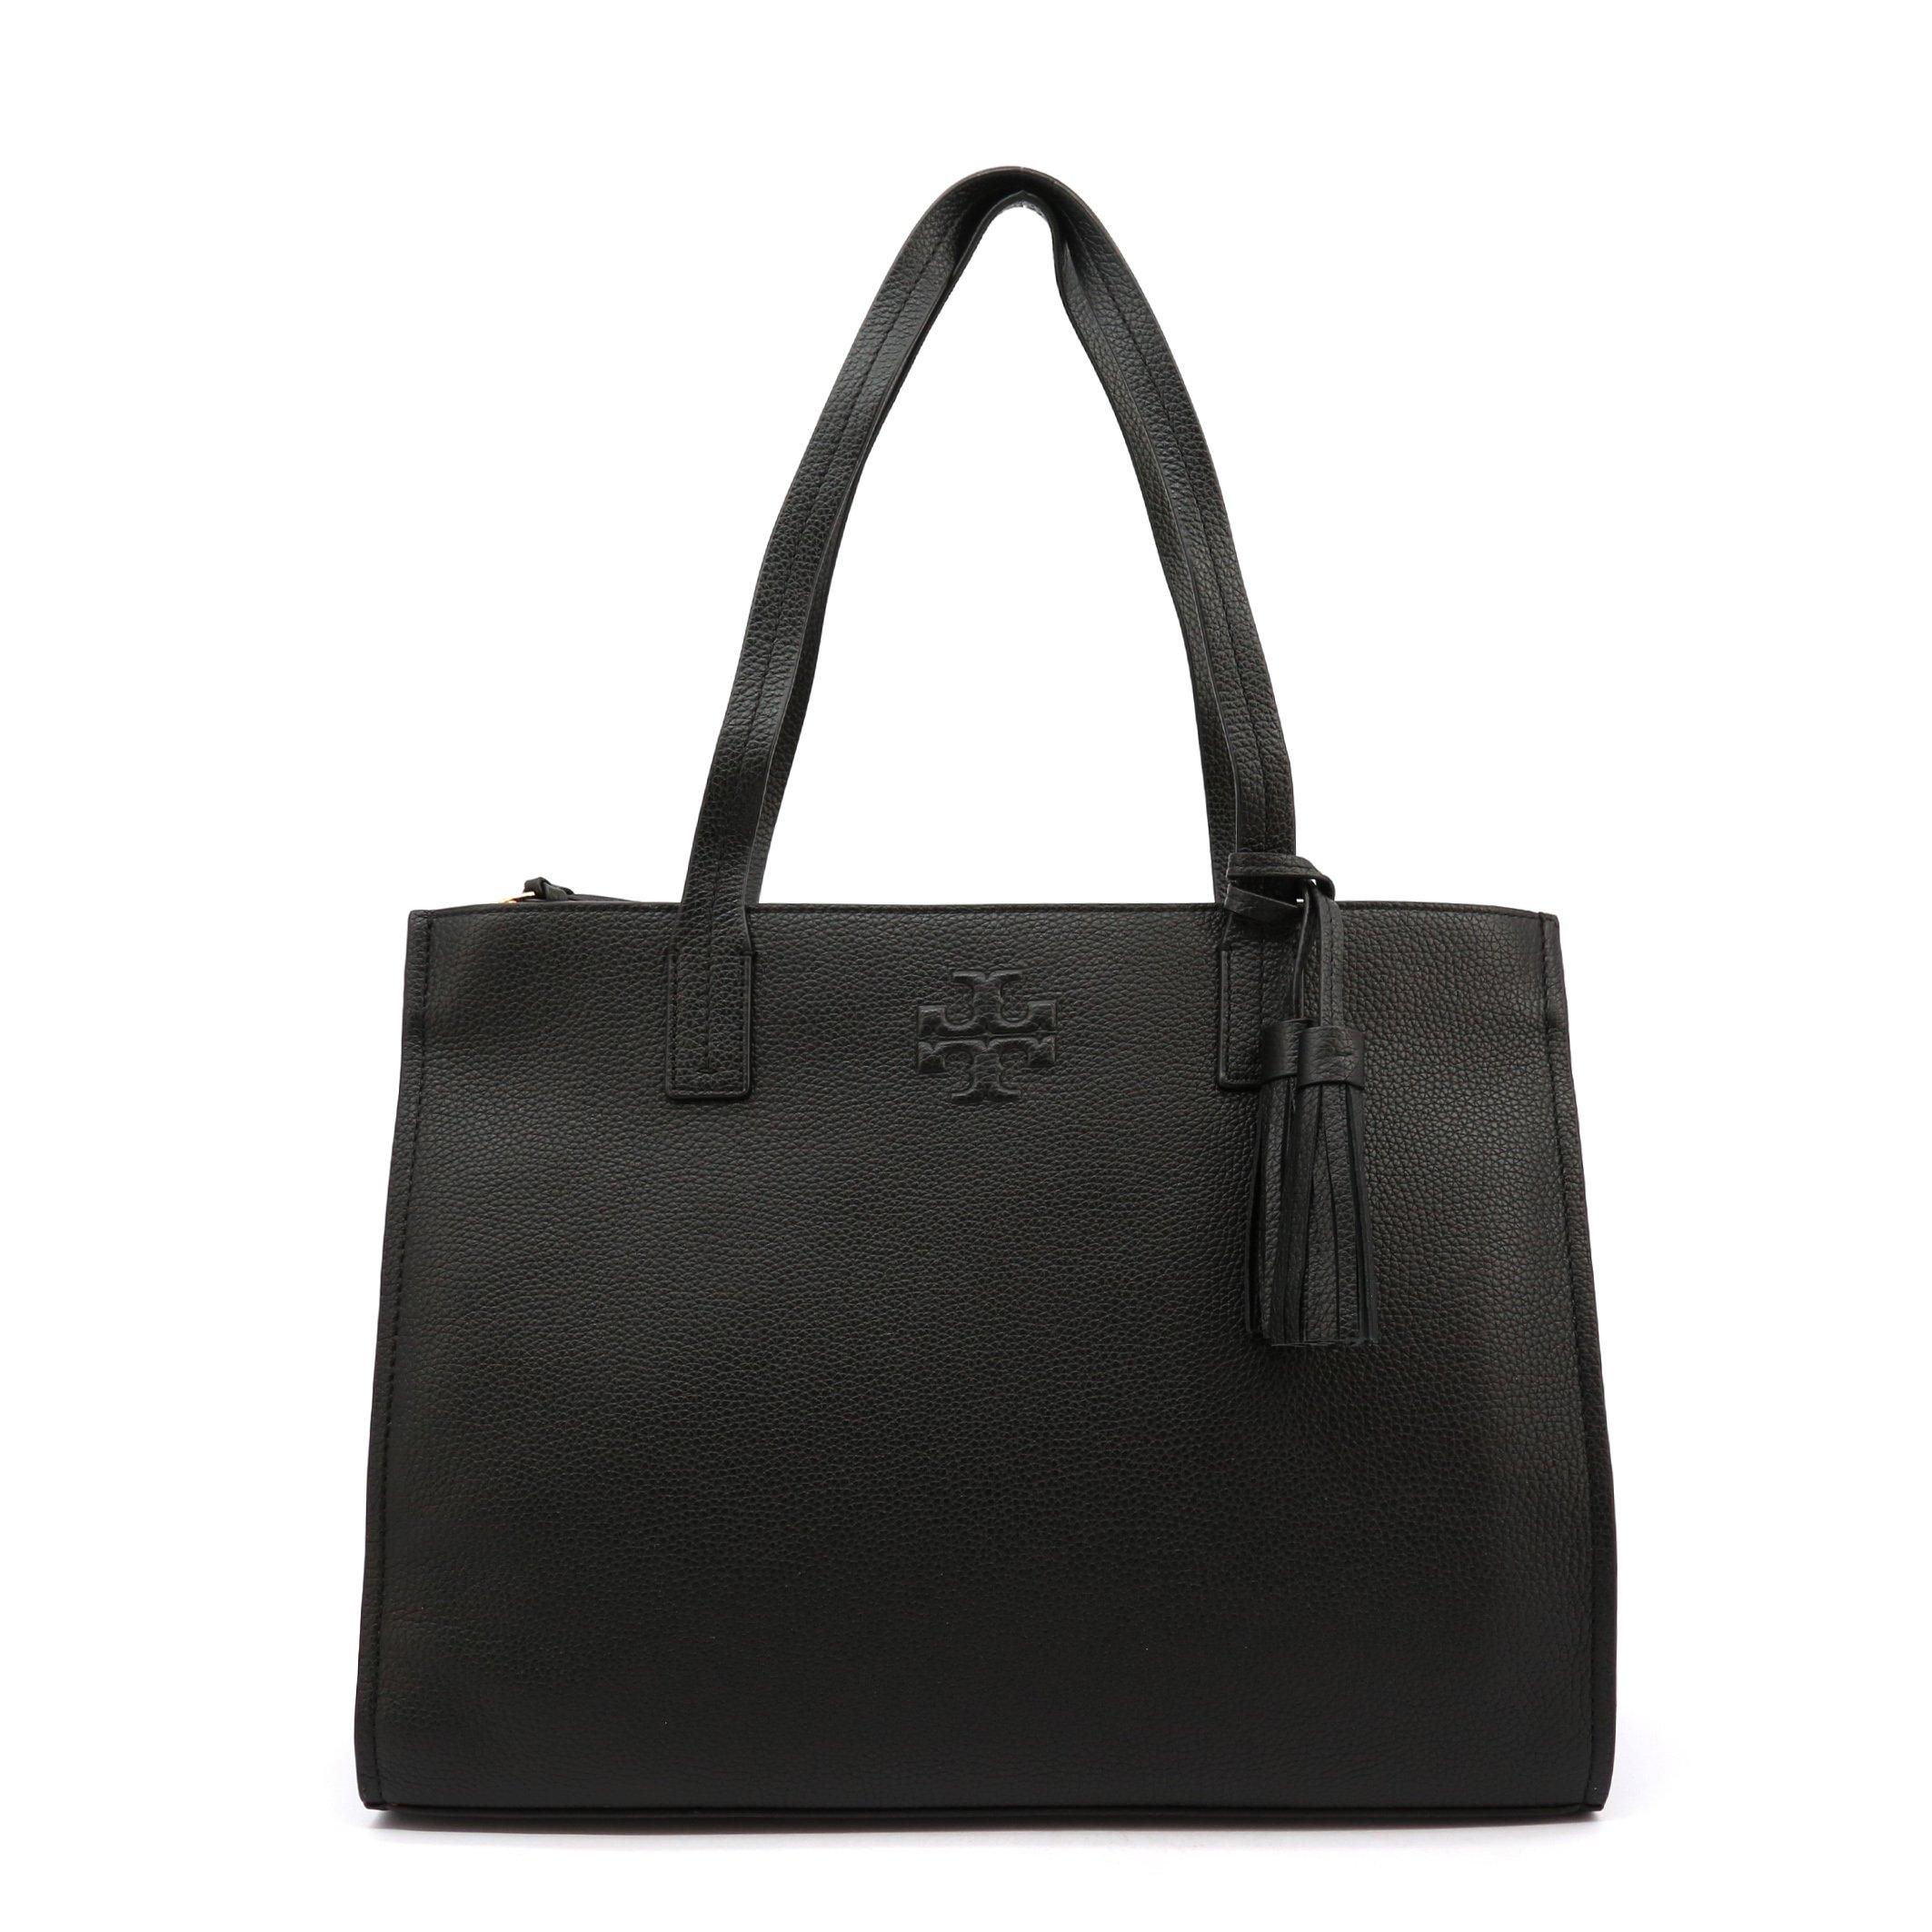 Tory Burch Women's Shopping Bag Various Colours 73511 - black NOSIZE